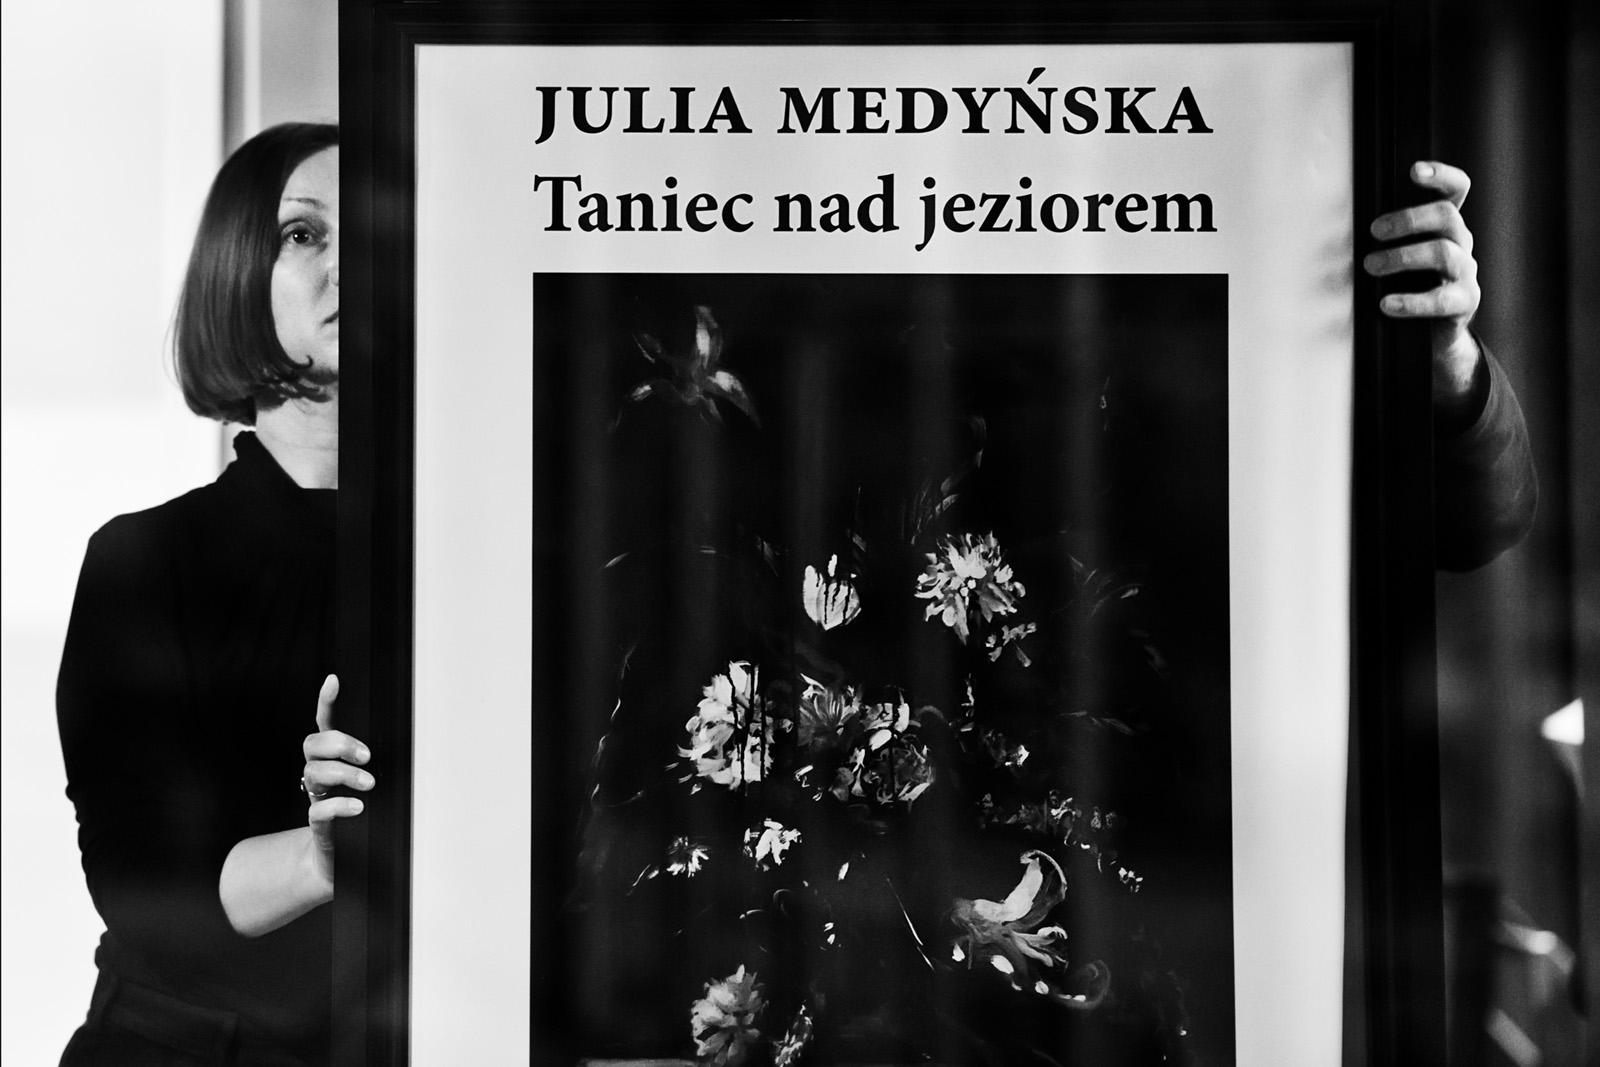 Opening: Julia Medyńska - Dancing by the Lake